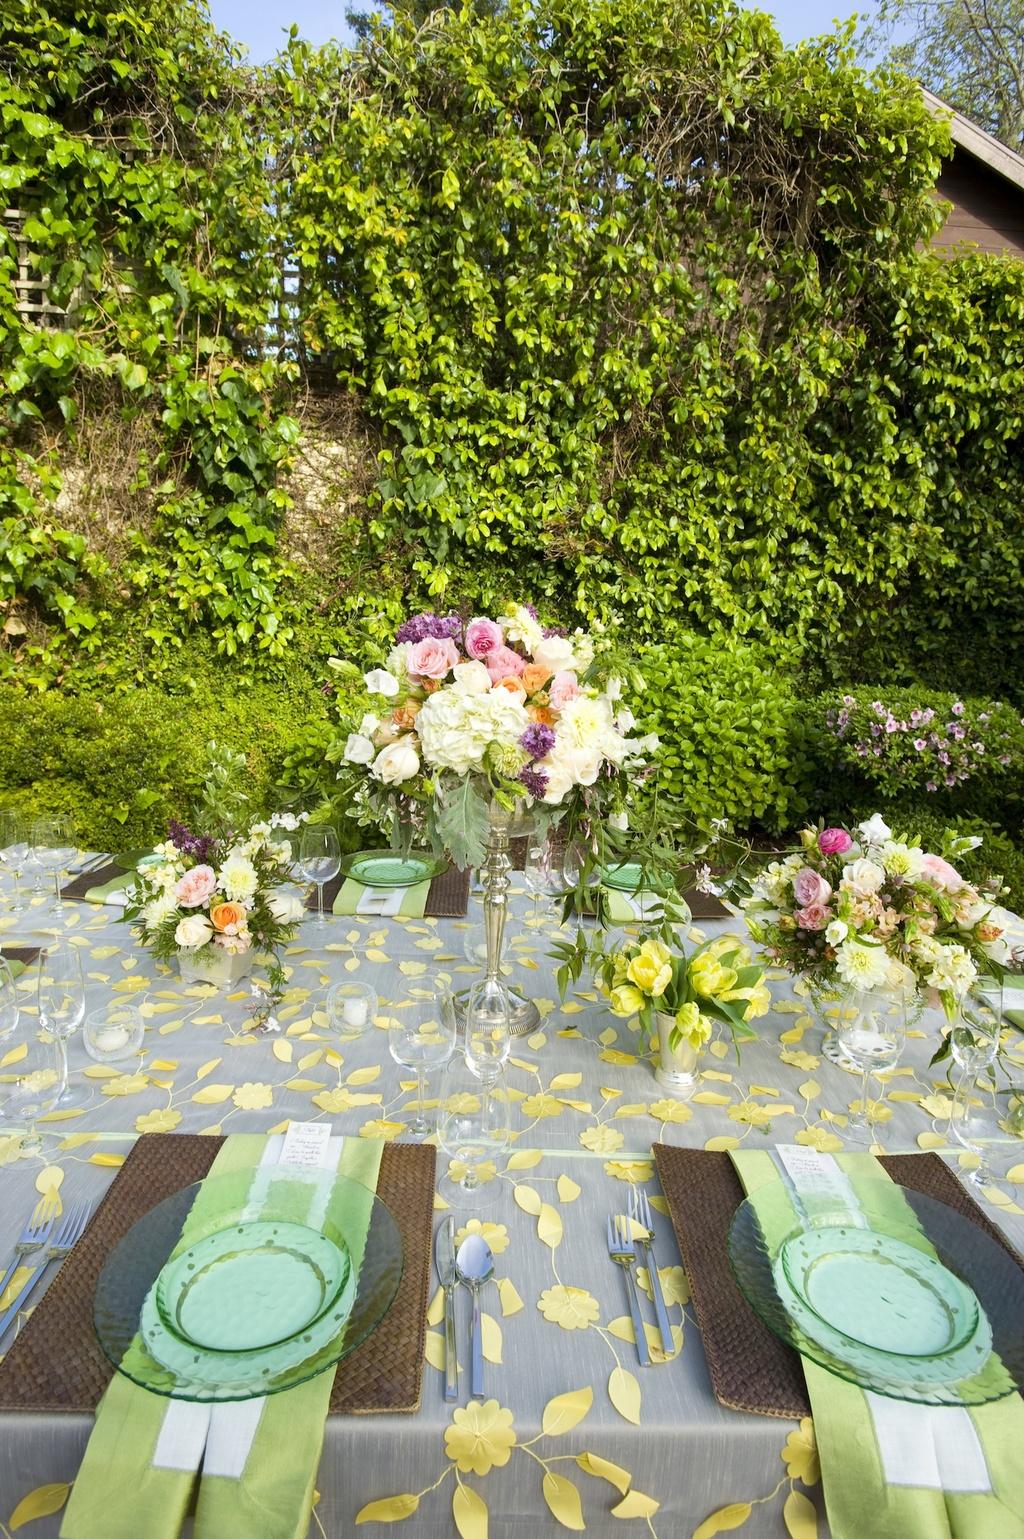 Whimsical-garden-wedding-elegant-centerpiece-pink-green.full